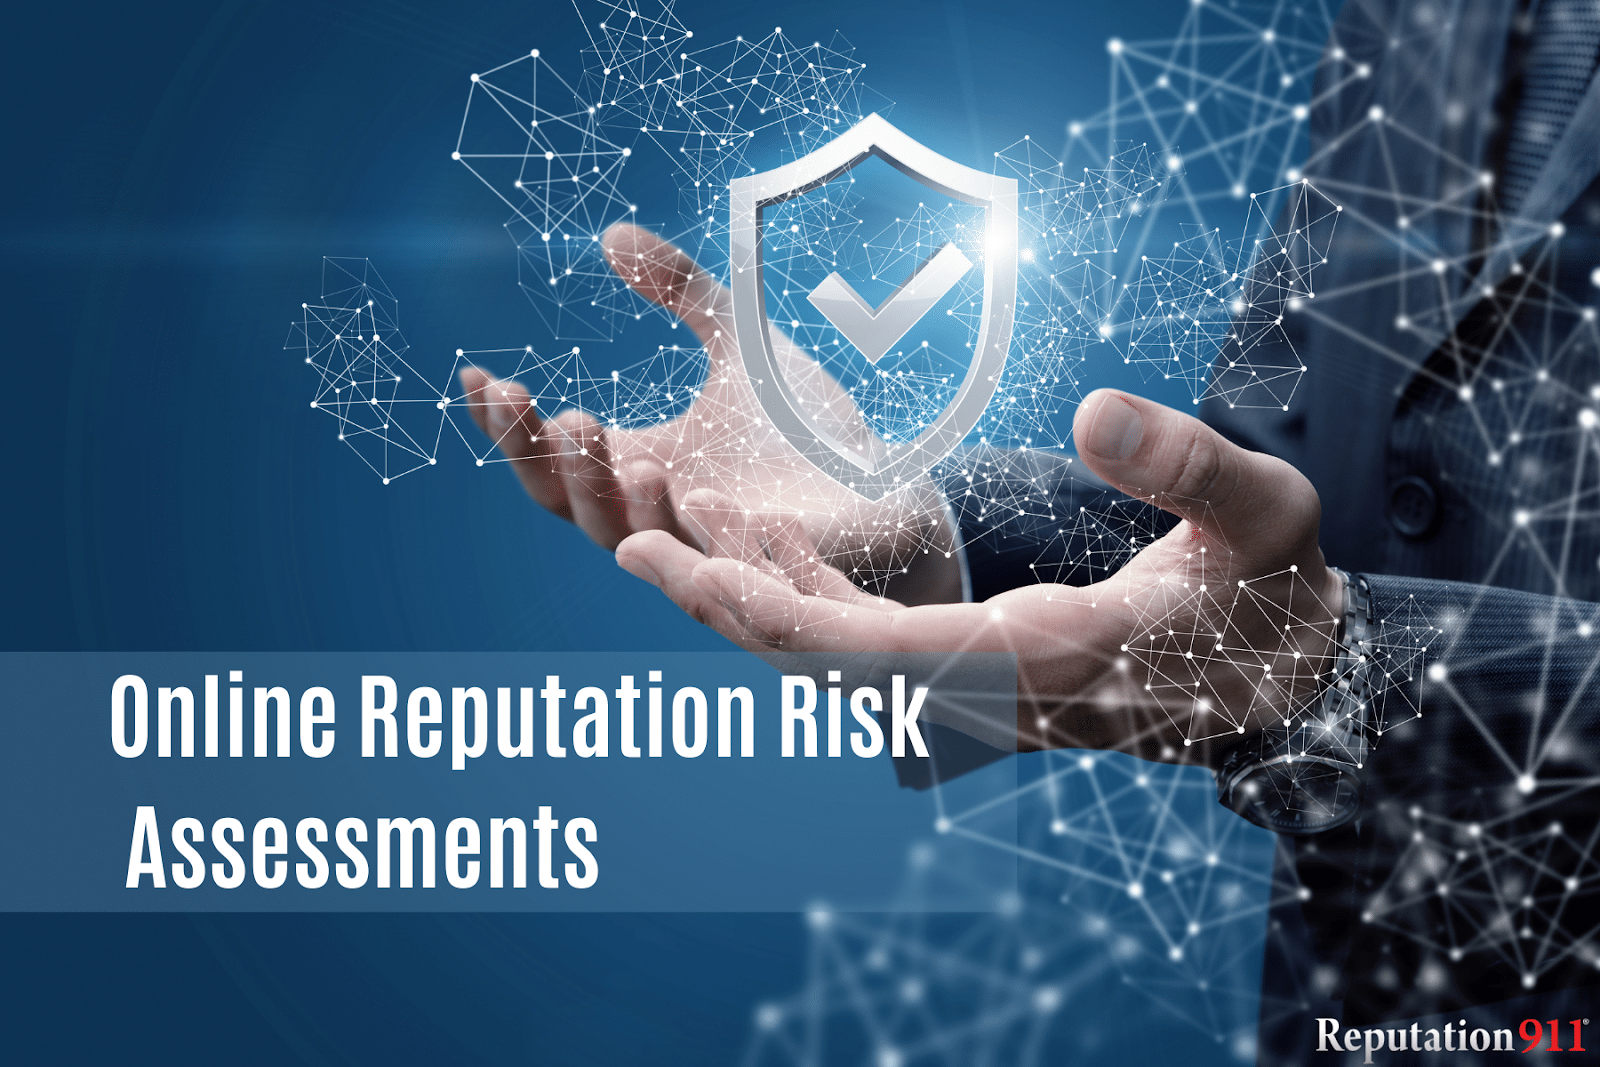 Online Reputation Risk Assessments